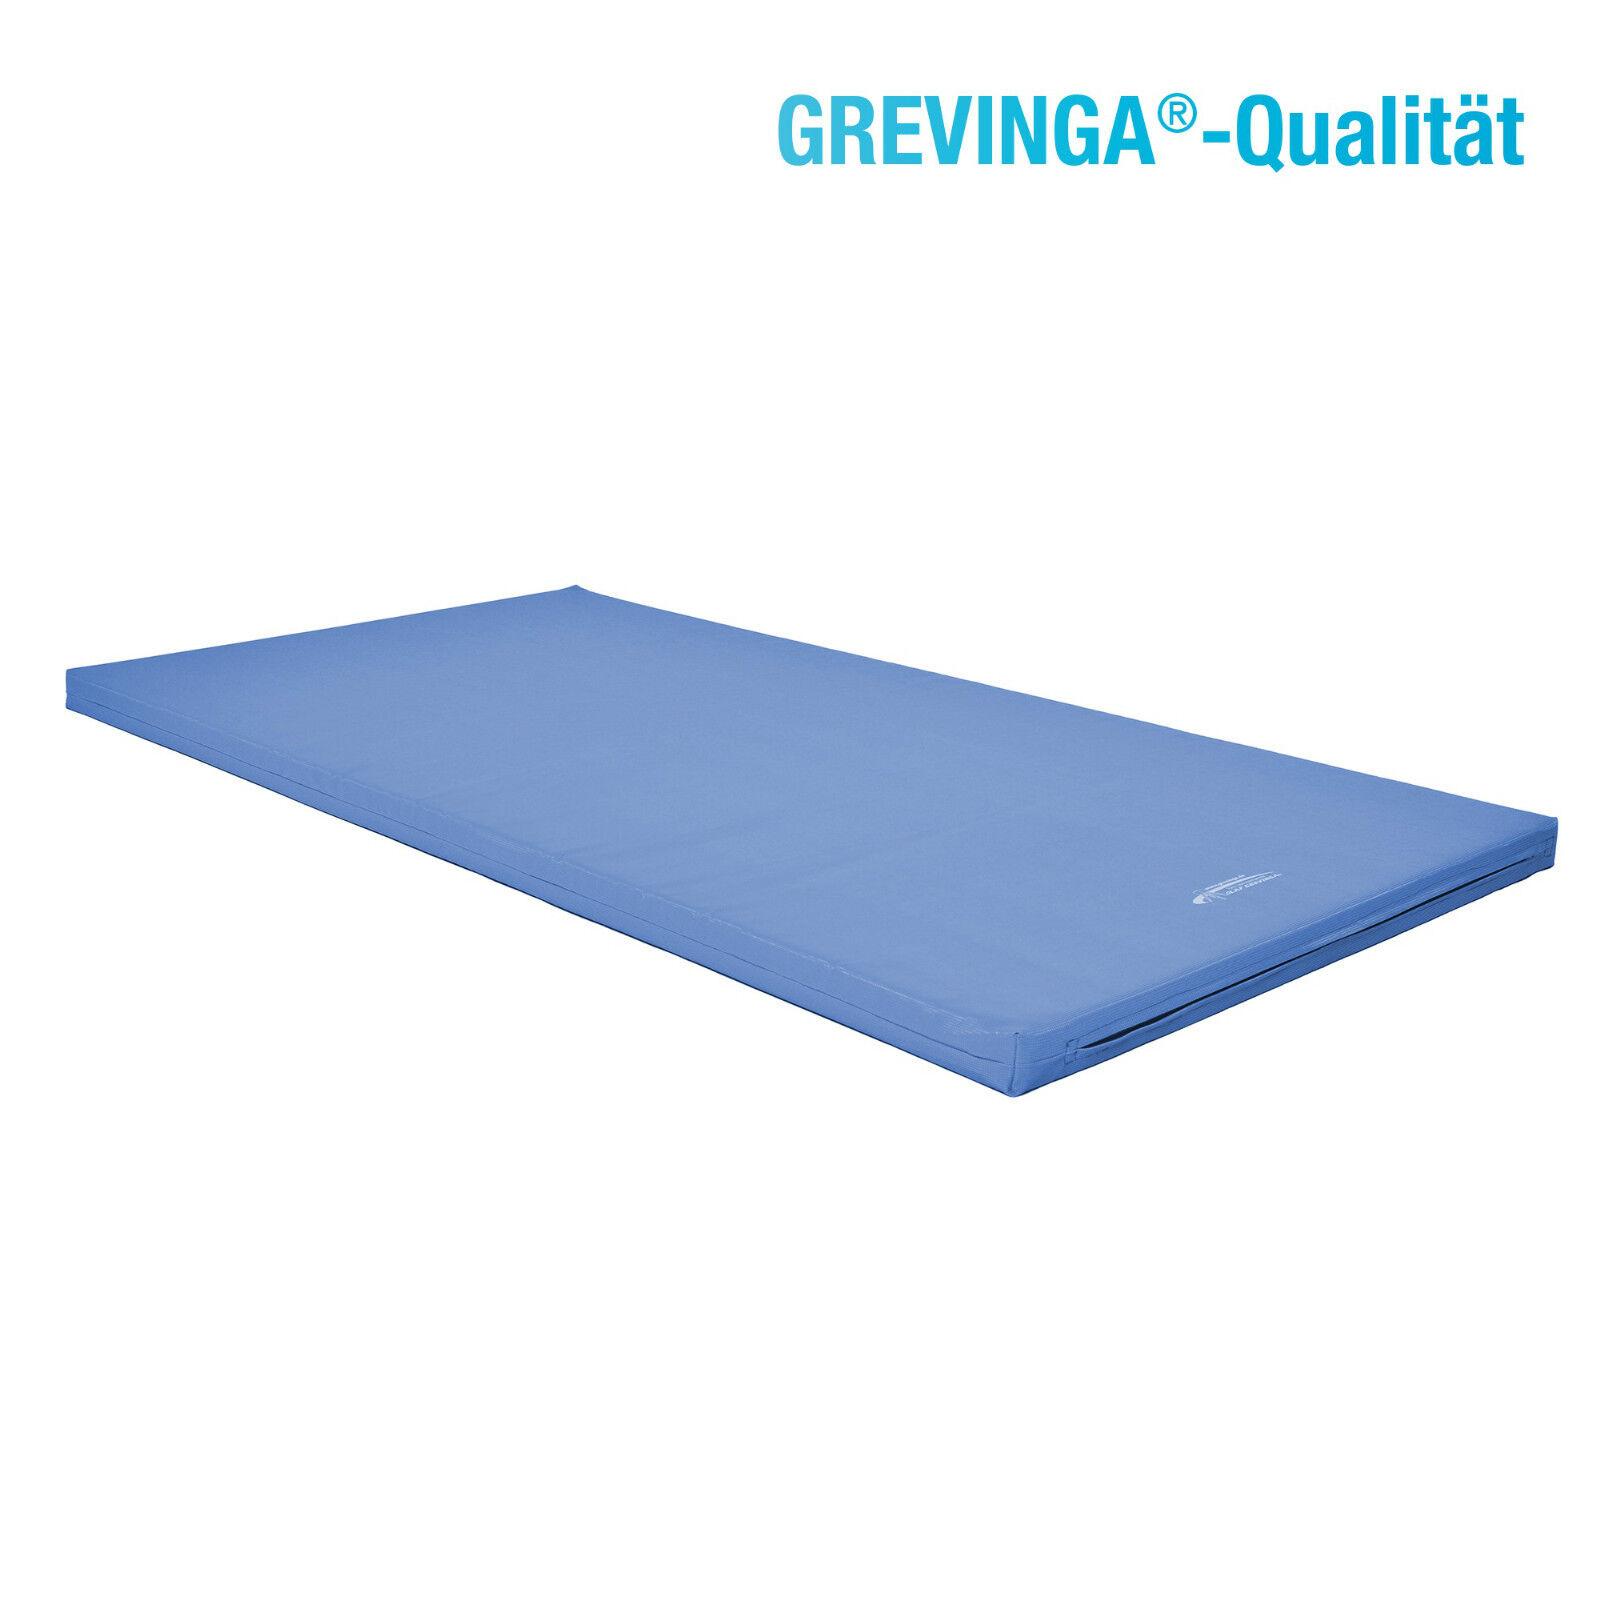 (KIMA) Grevinga® KIDS Turn- und Sportmatte (RG22) ca. 150 x 100 x 8 cm (138964)